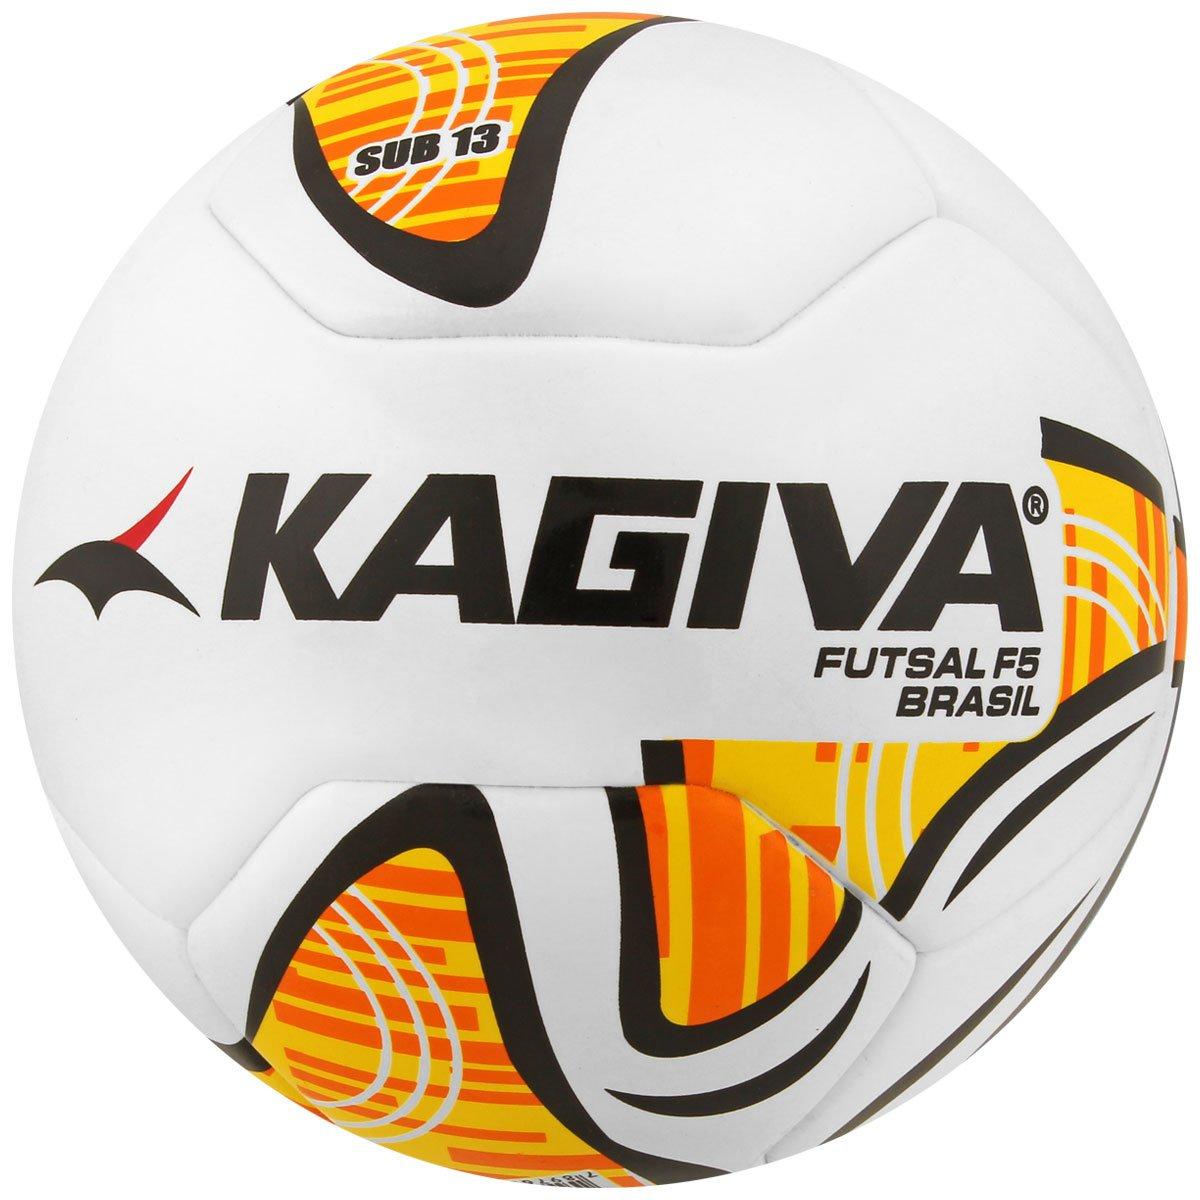 Bola Futebol Kagiva F5 Pro Sub 13 FPFS Futsal Infantil - Compre ... 039957413afb1